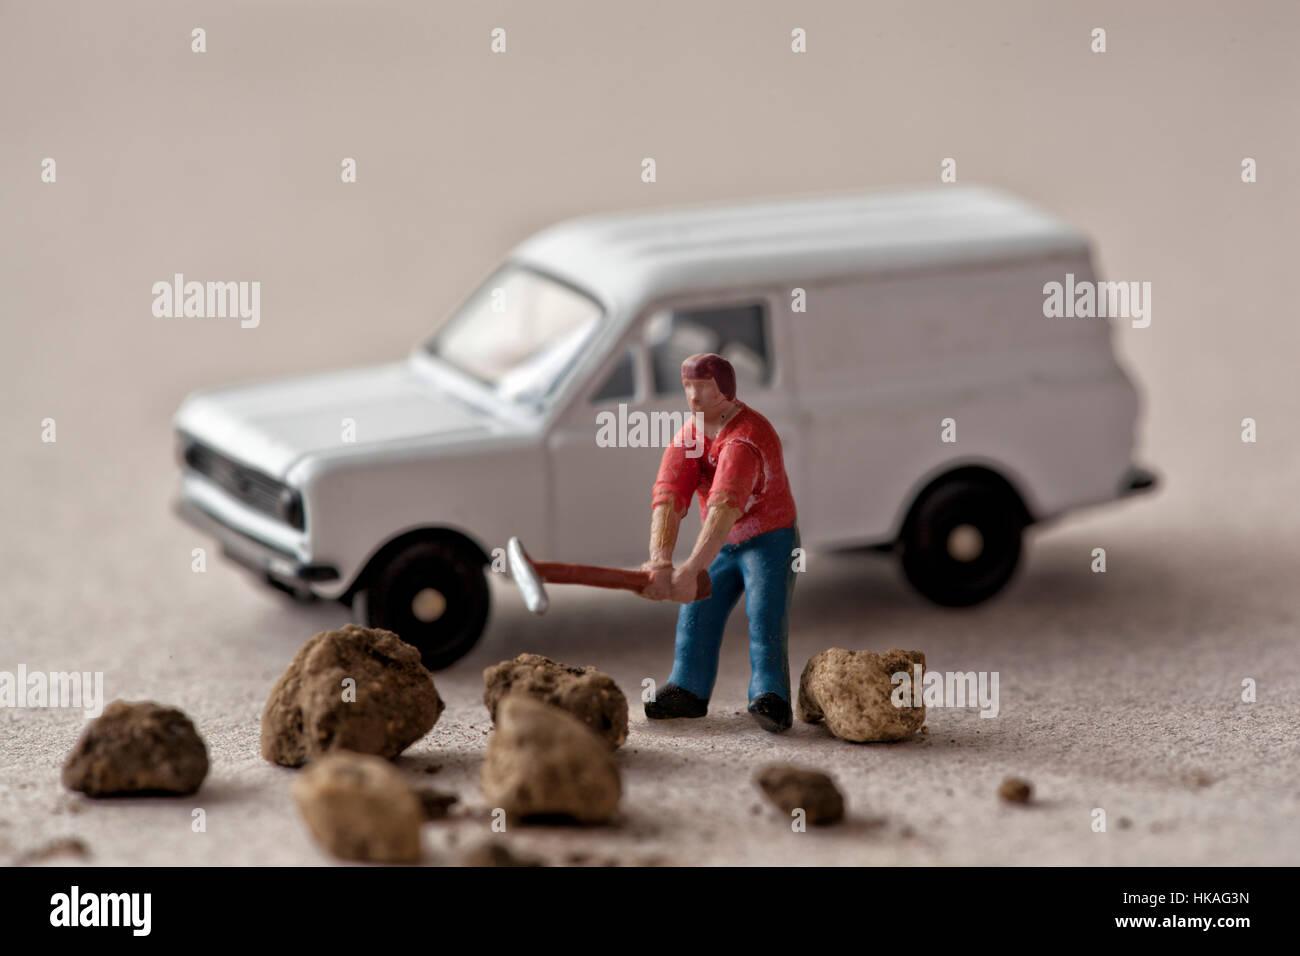 Miniature model workman hammers rocks next to a white van - Stock Image